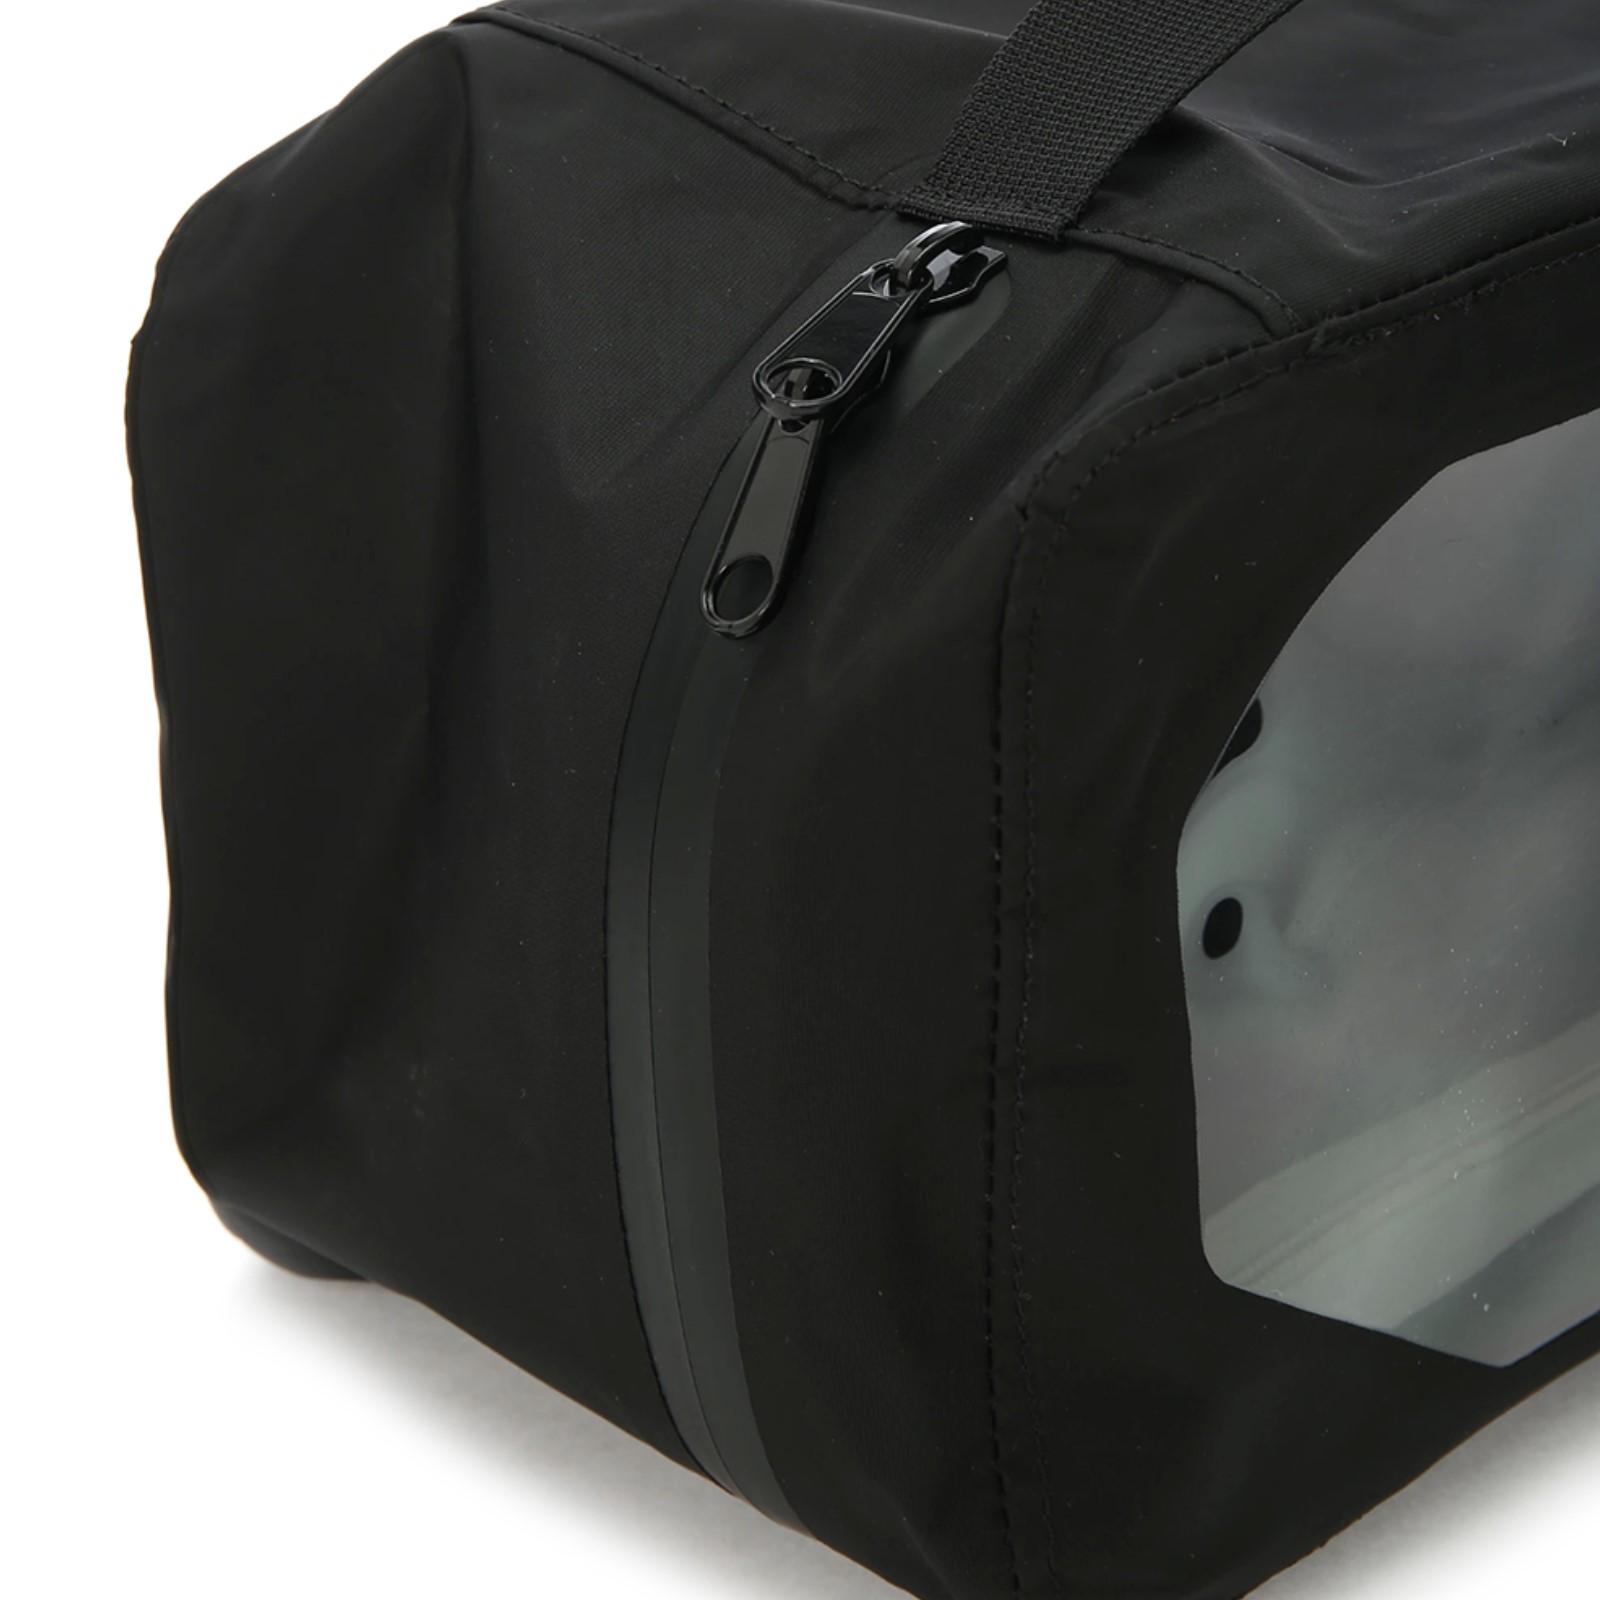 COB MASTER コブマスター HD210D PL_WATERPROOF STORAGE CASE BLACK